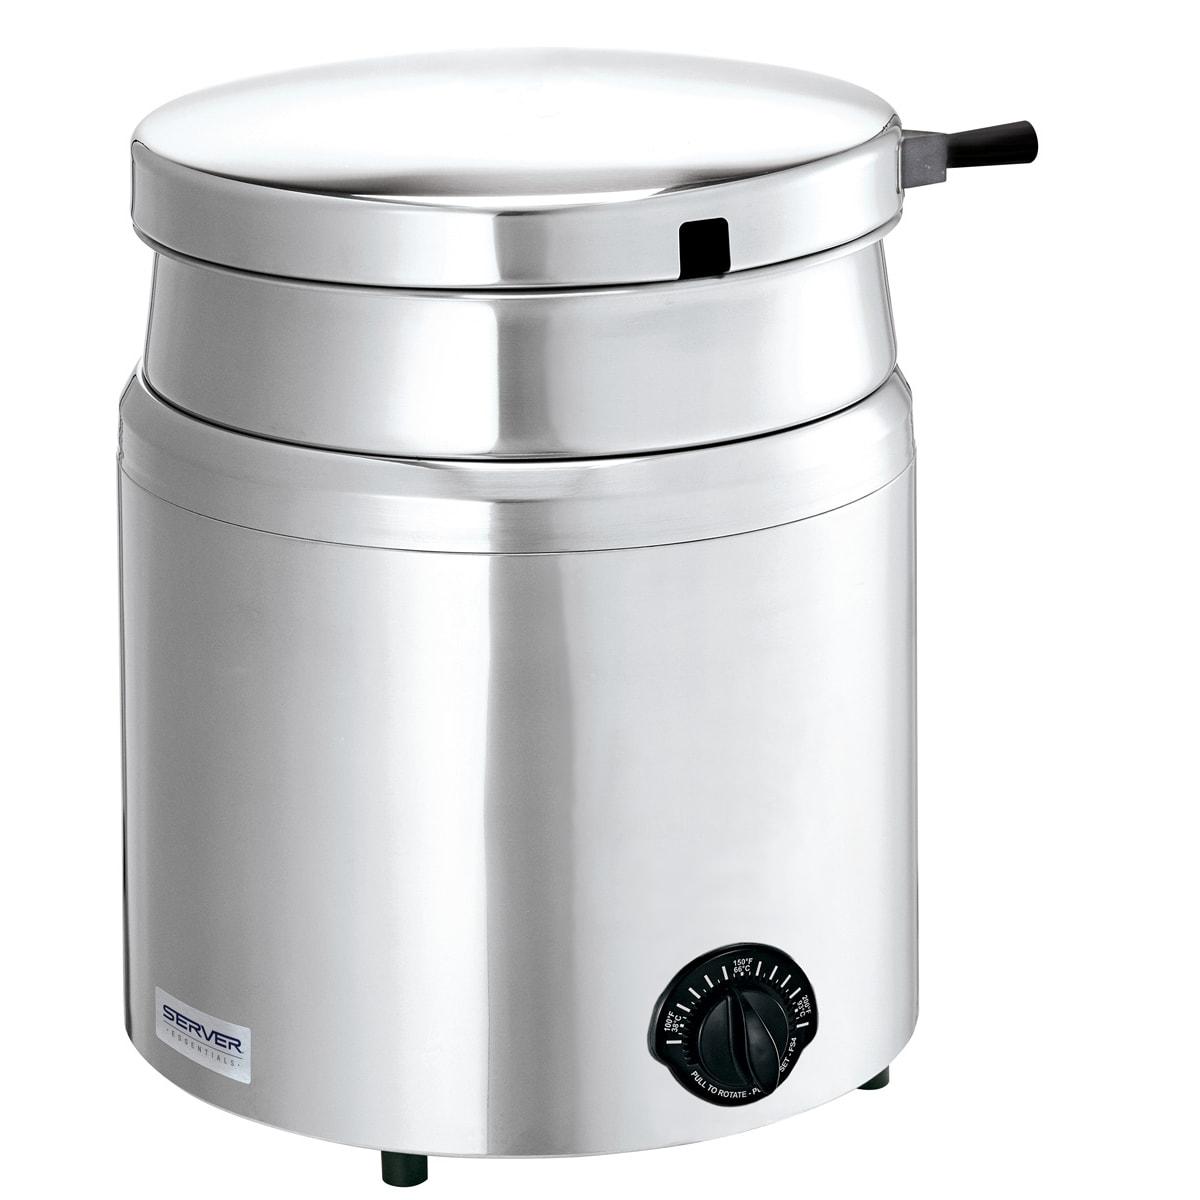 Server 84100 11 qt Countertop Soup Warmer w/ Thermostatic Controls, 120v